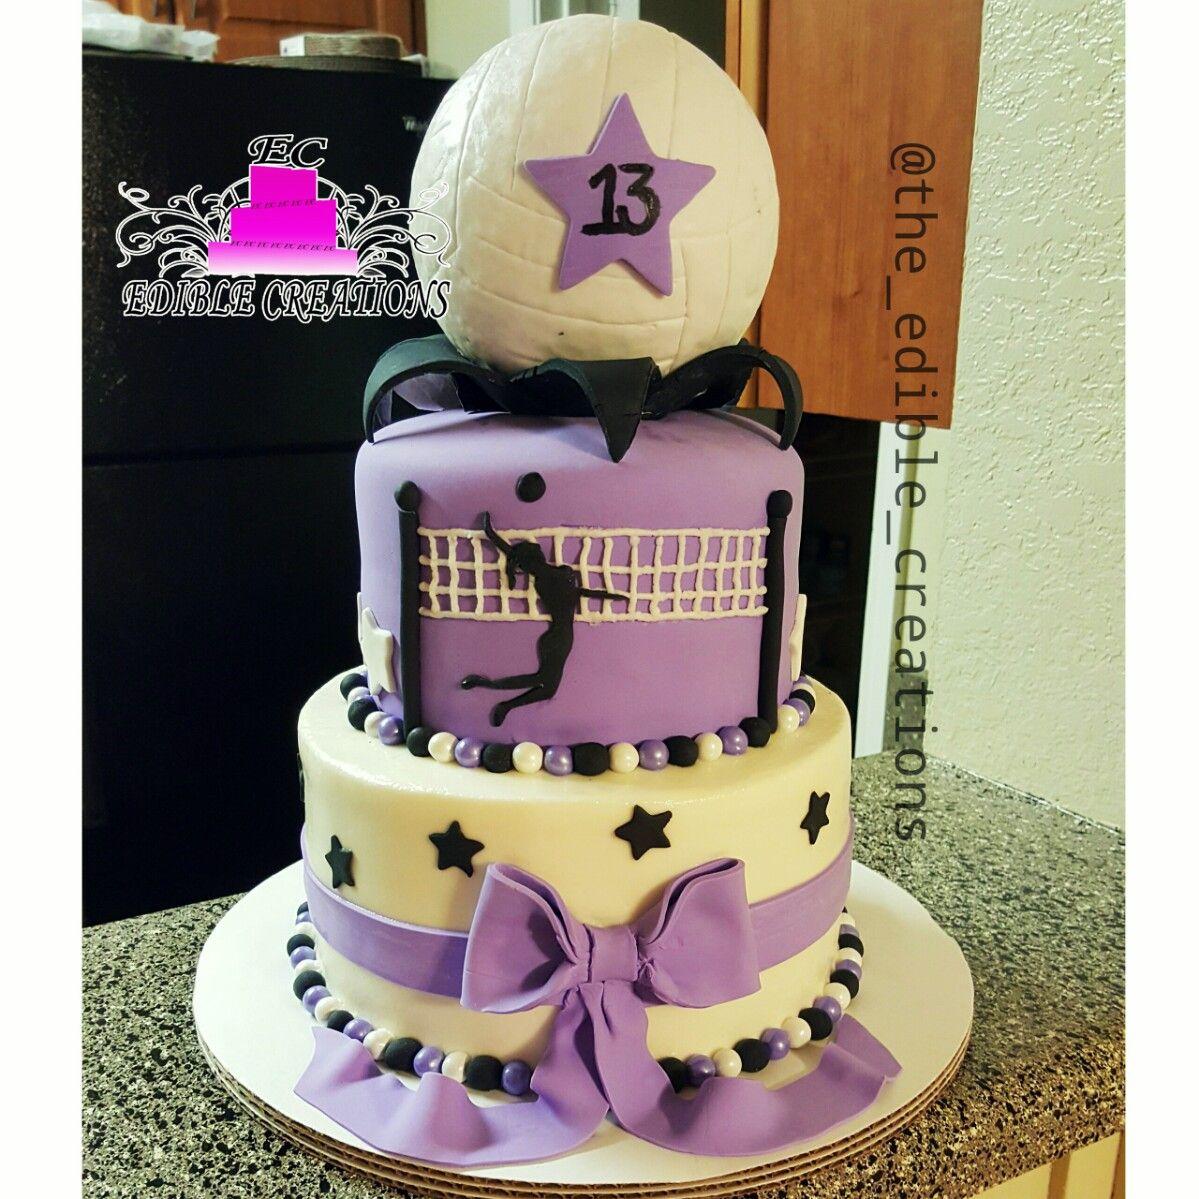 Volleyball Volleyball Birthday Cakes Volleyball Cakes Volleyball Birthday Party